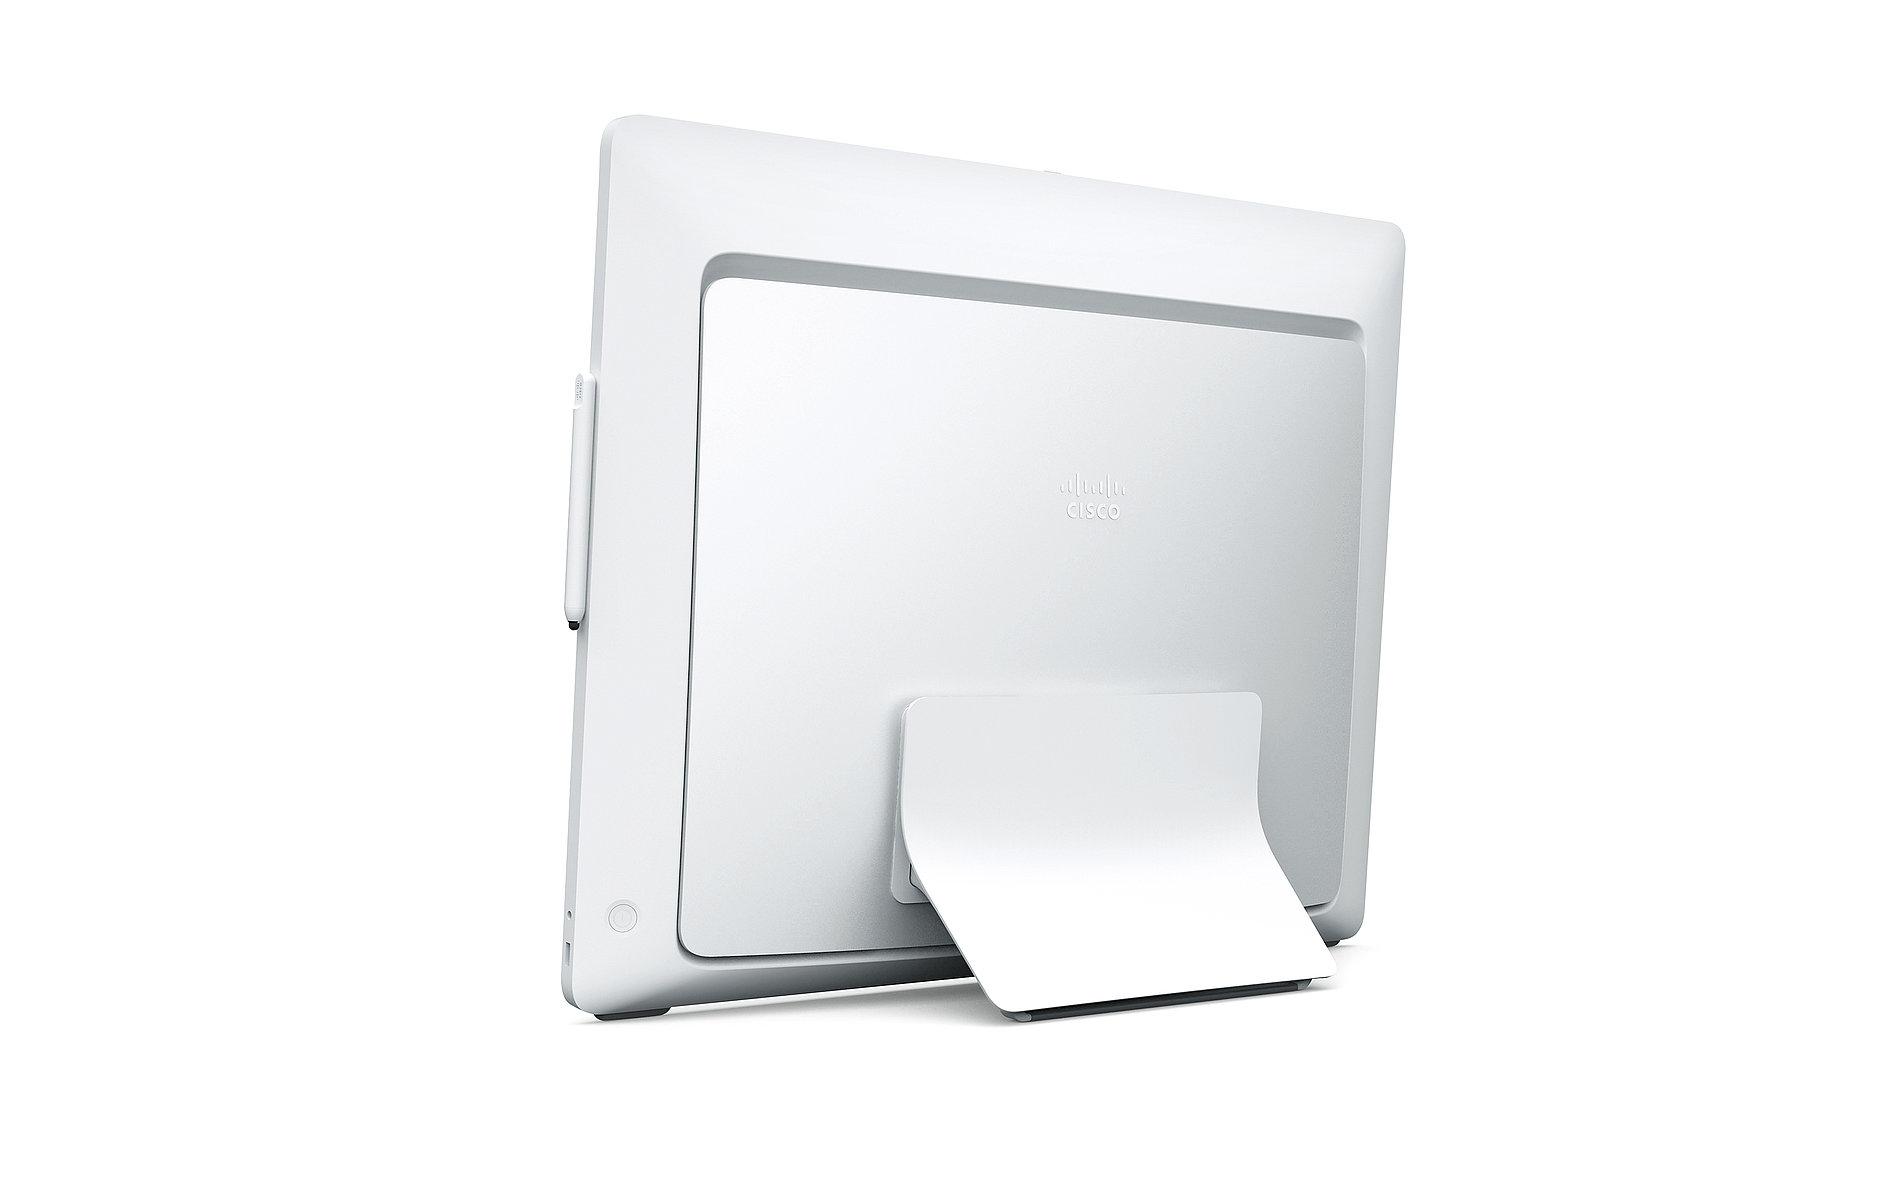 Cisco Webex Desk Pro | Red Dot Design Award